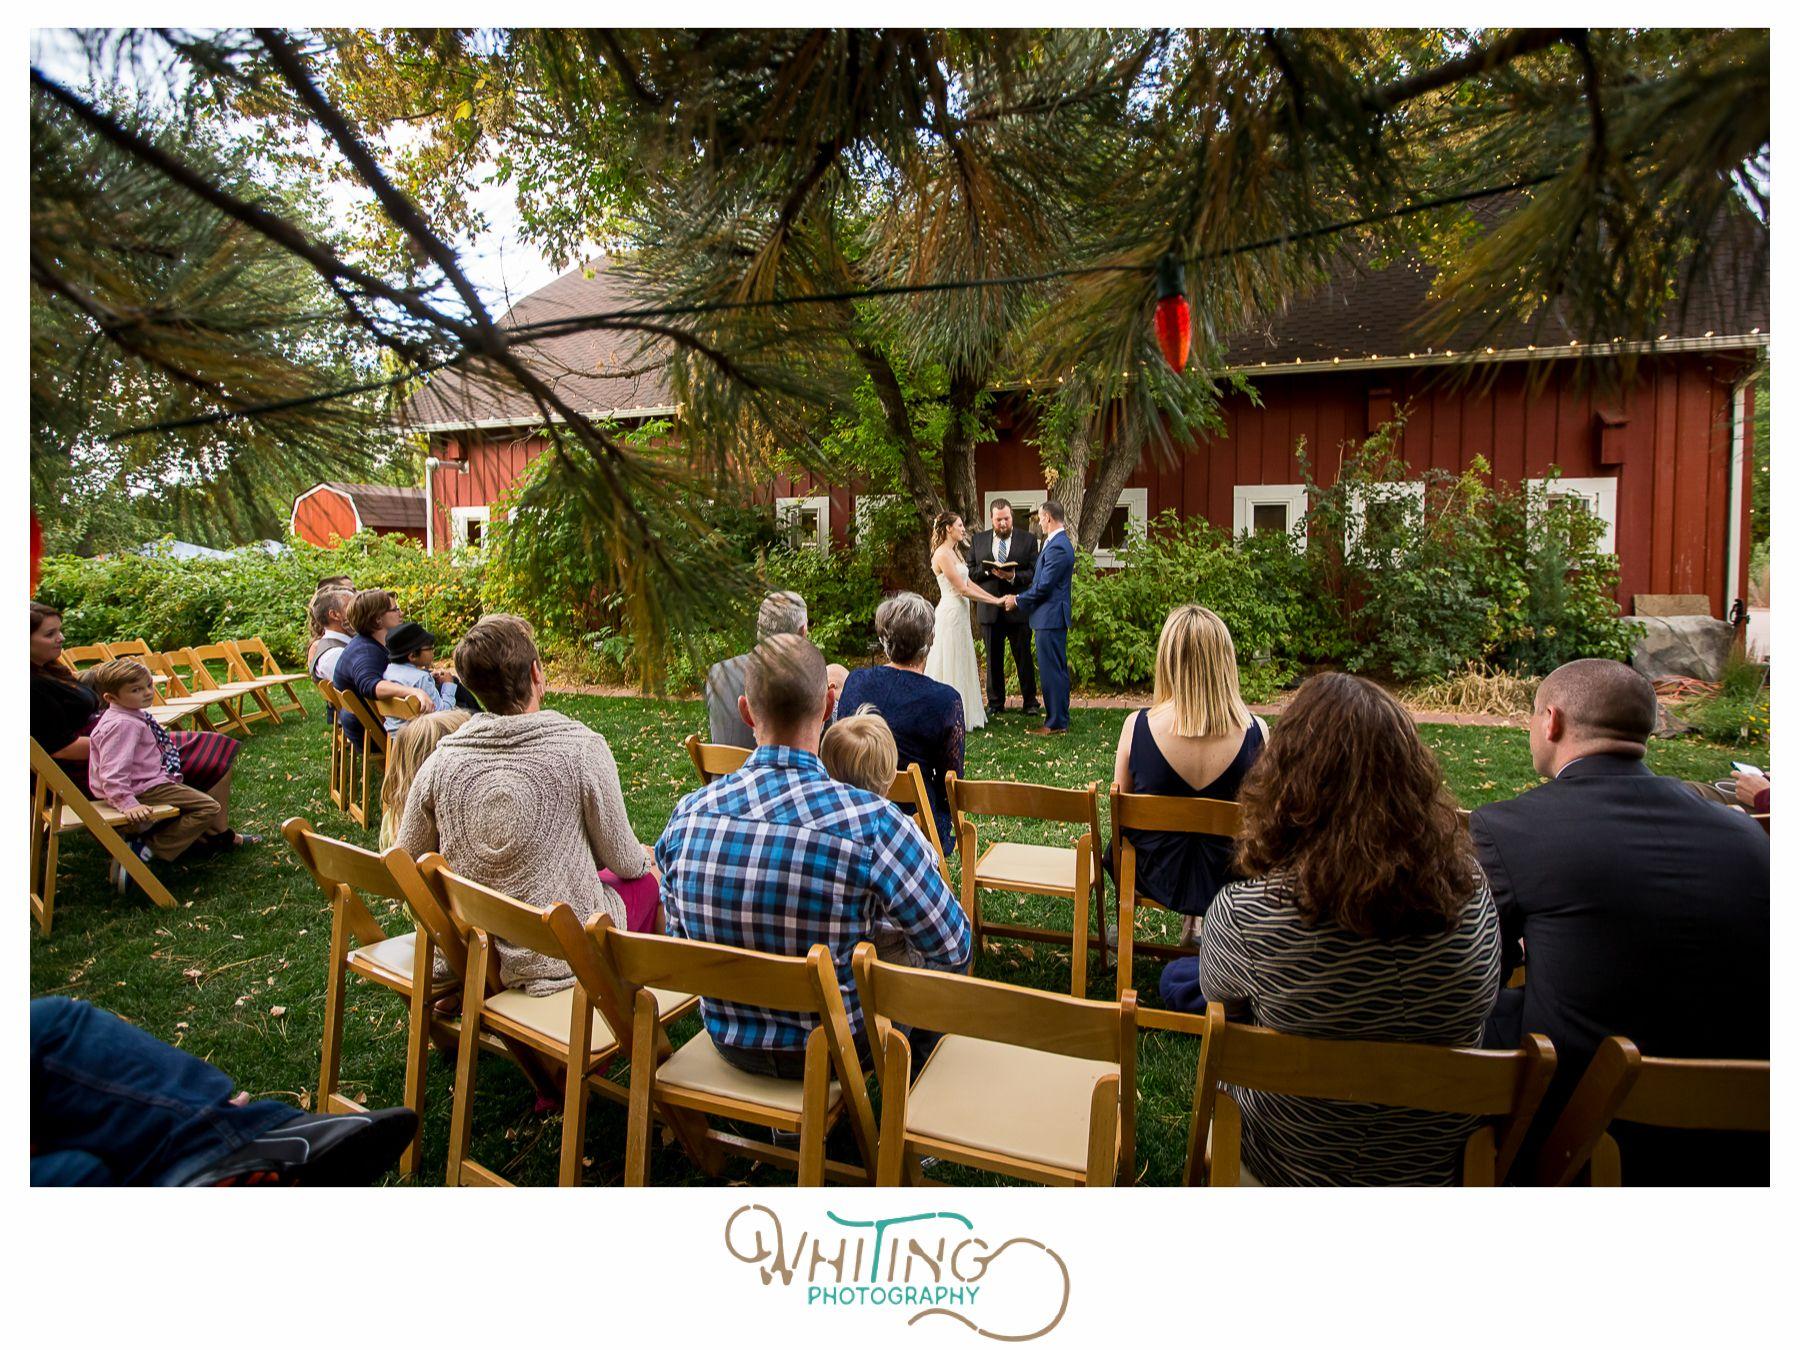 Denver & Estes Park Colorado Wedding Photos | Pinterest | Estes park ...